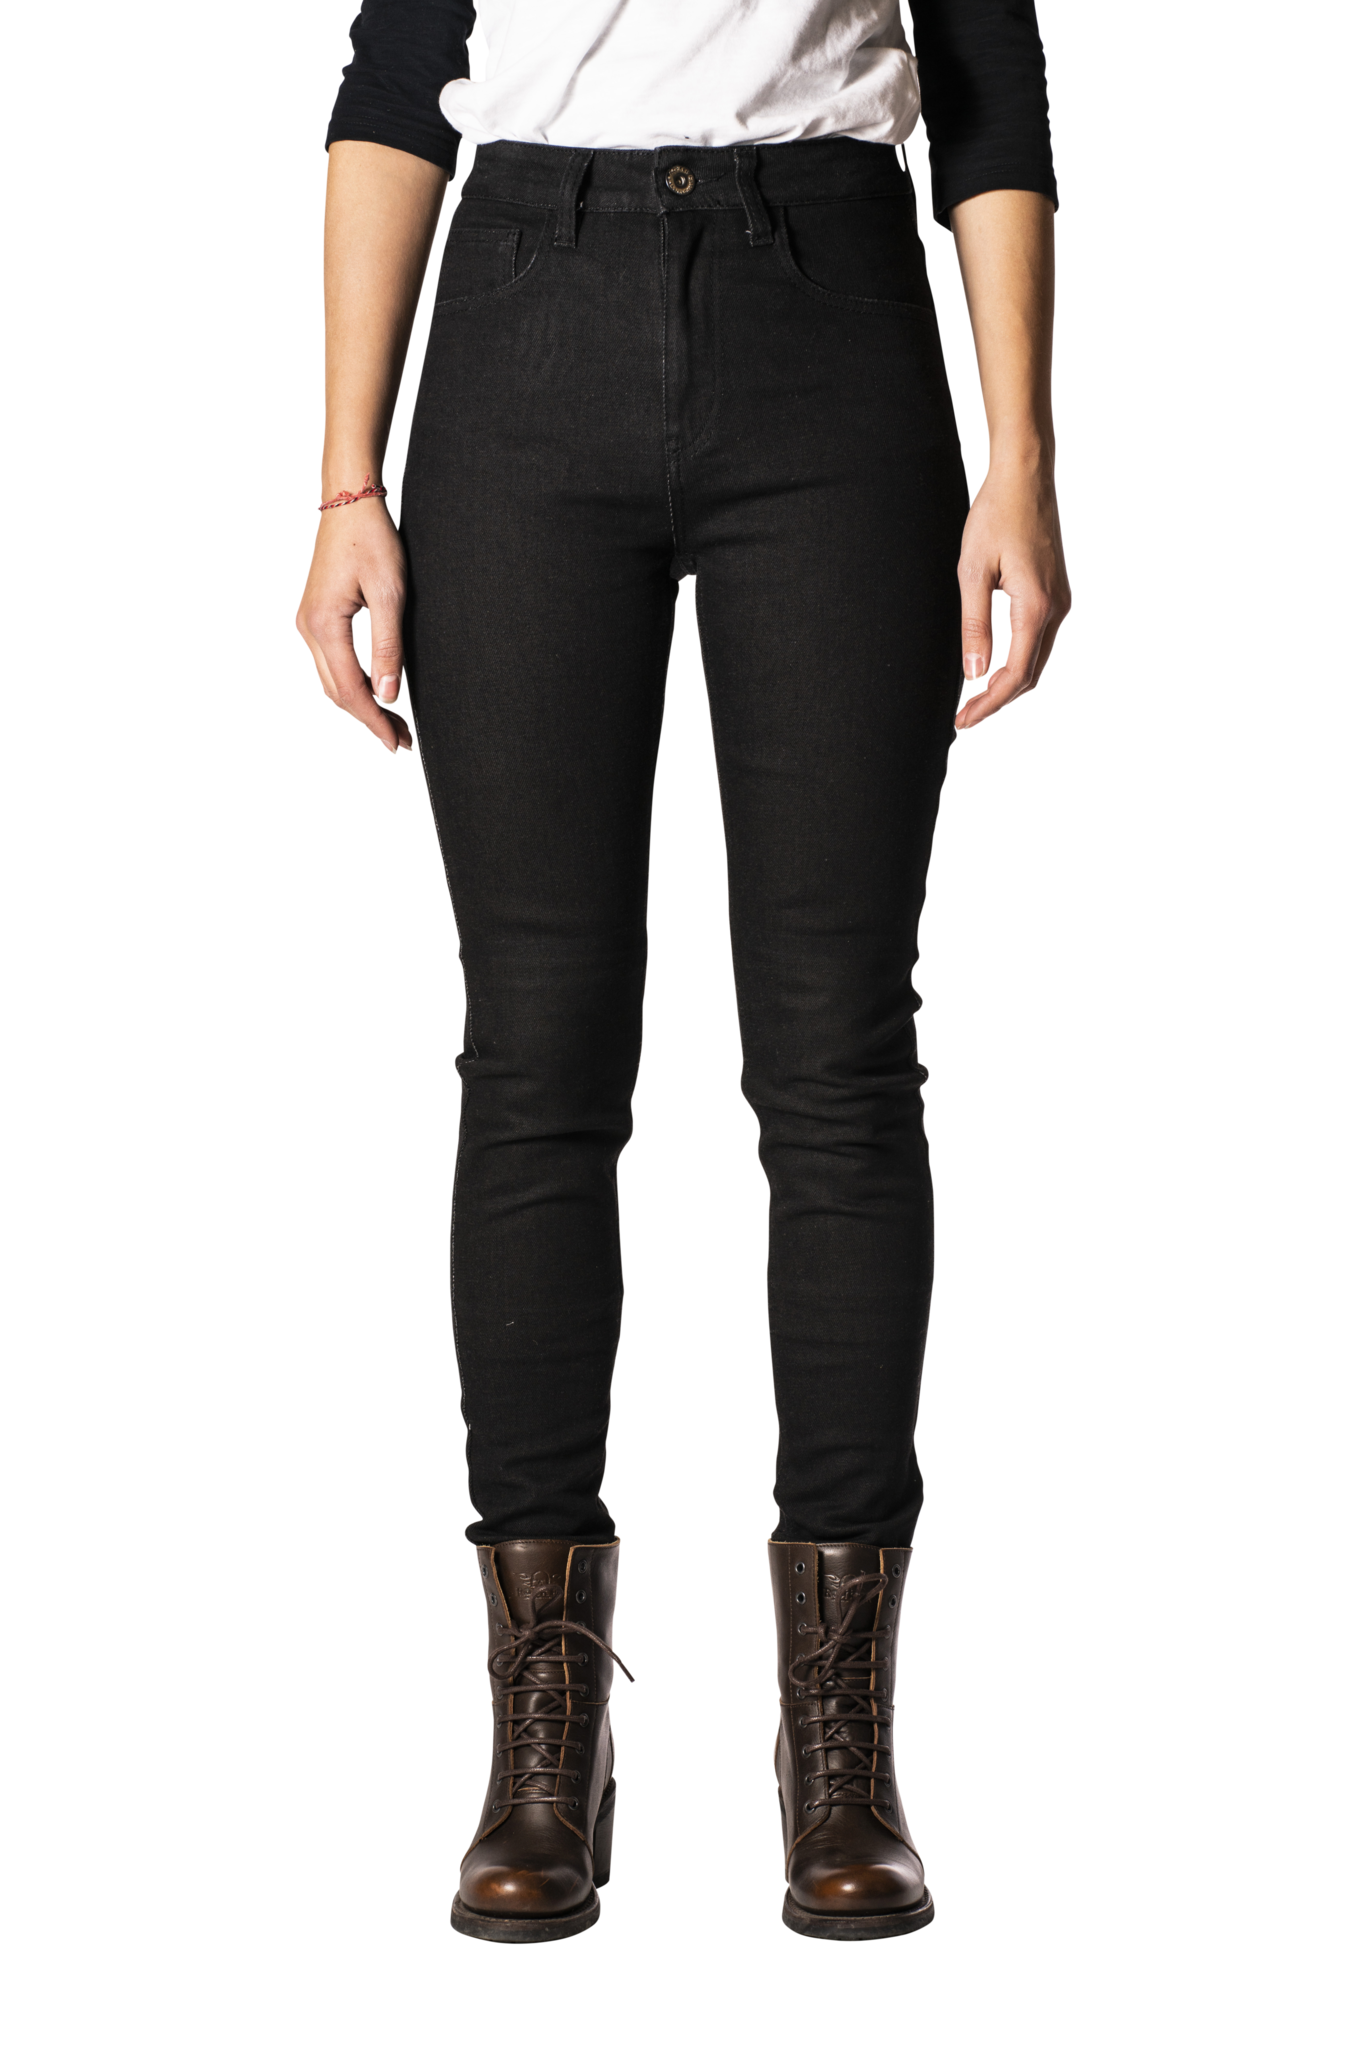 Rokkertech high waist black slim dames motorbroek L32-1